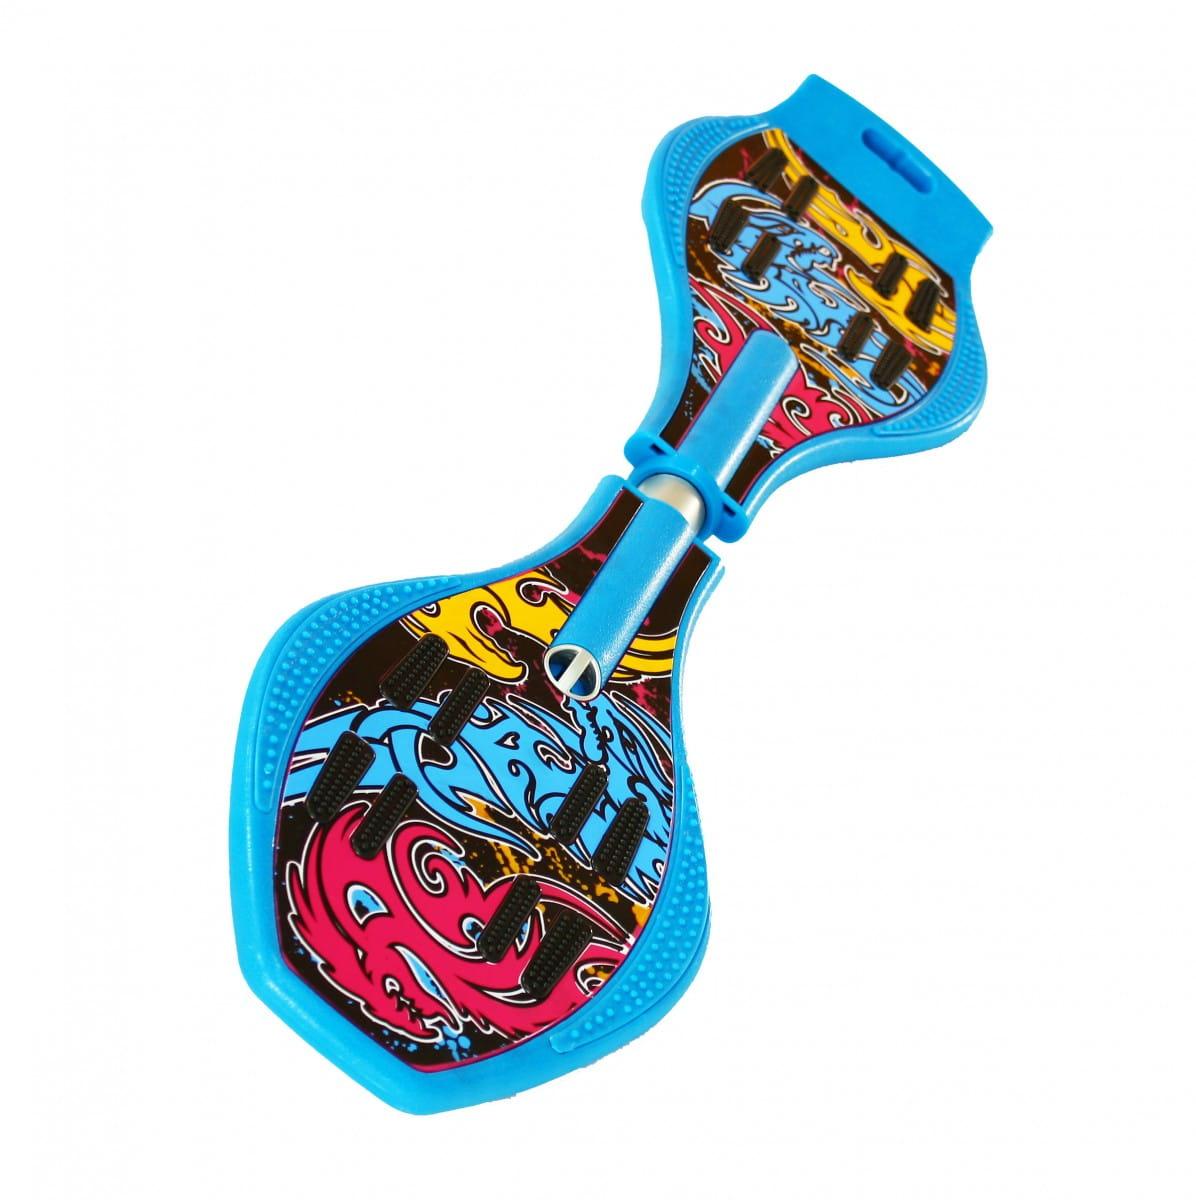 Двухколесный скейт Dragon Board Totem - синий